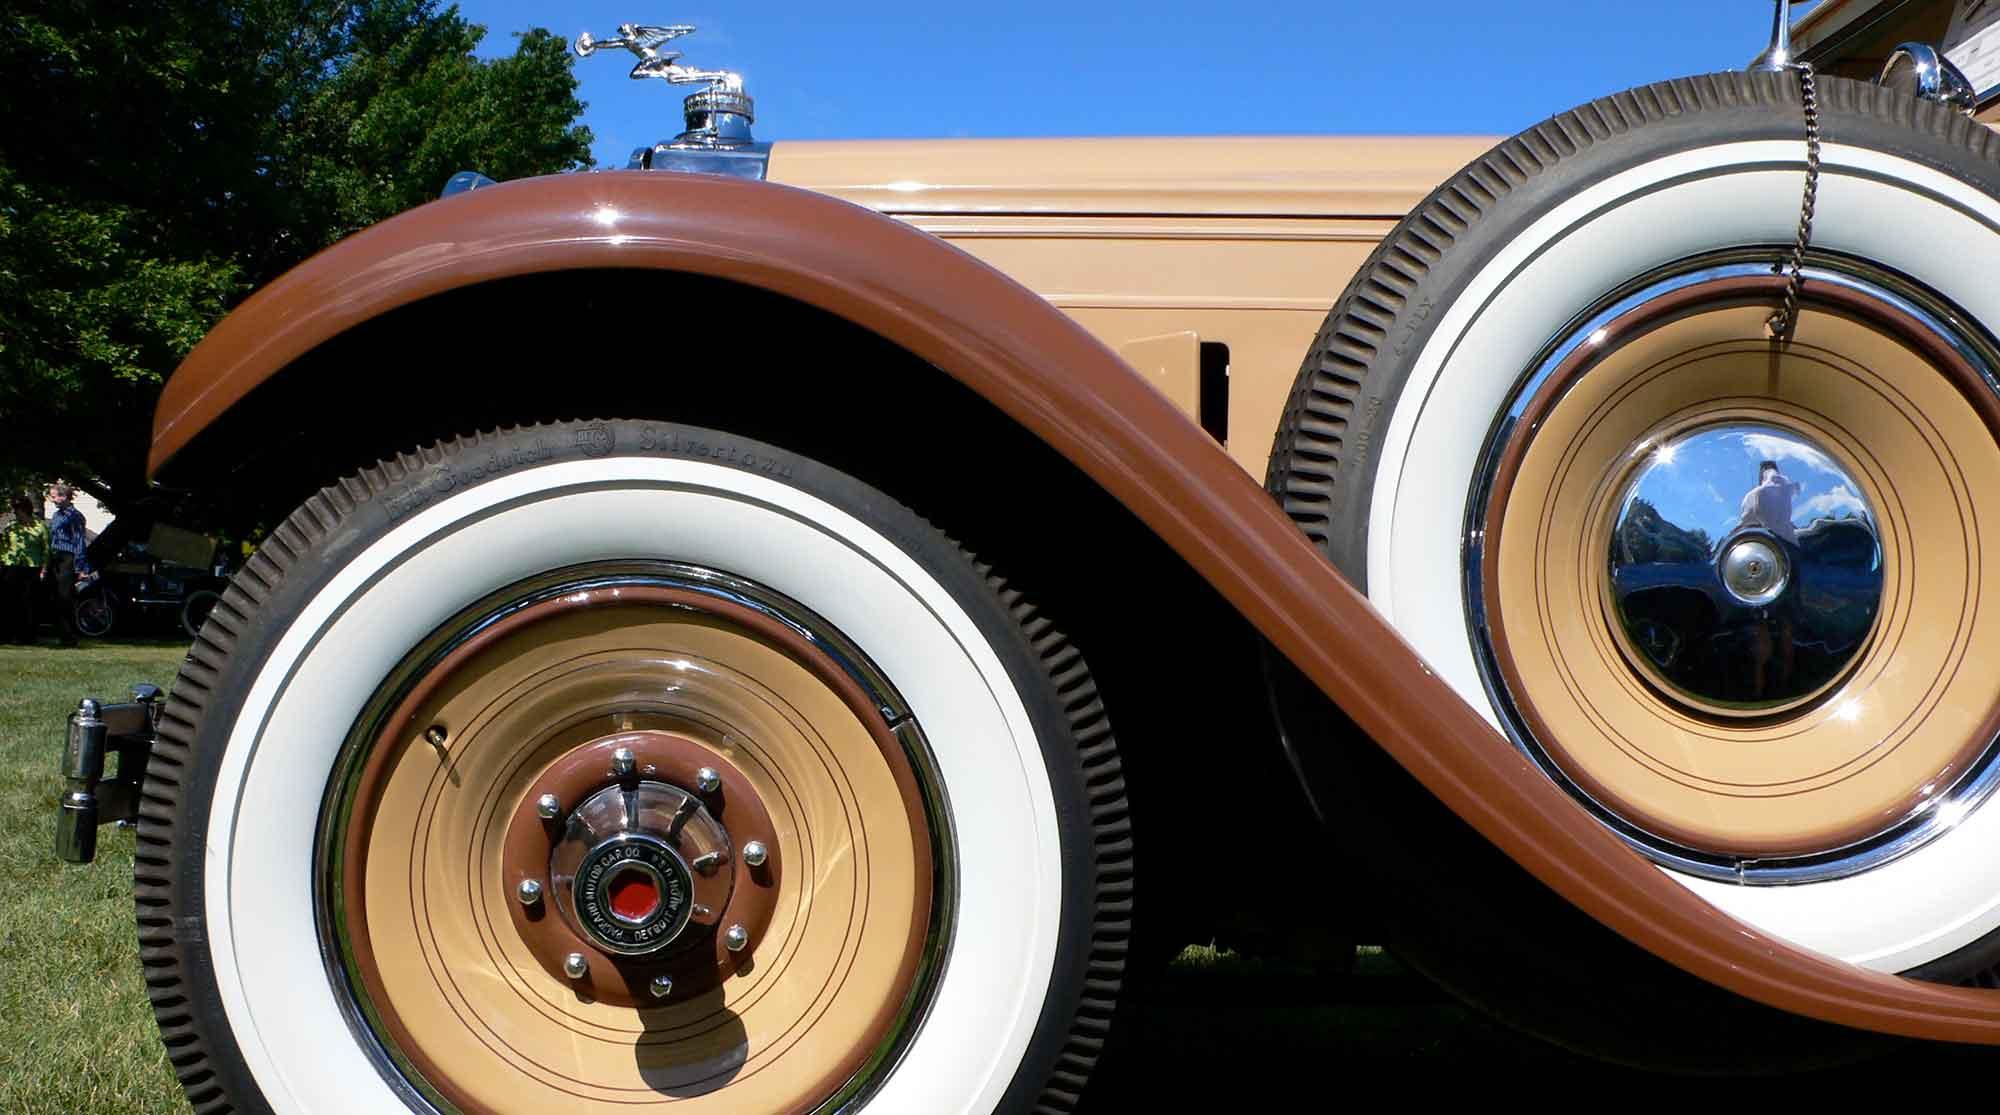 Senior Class 1929 Packard owned by Warren Rubin